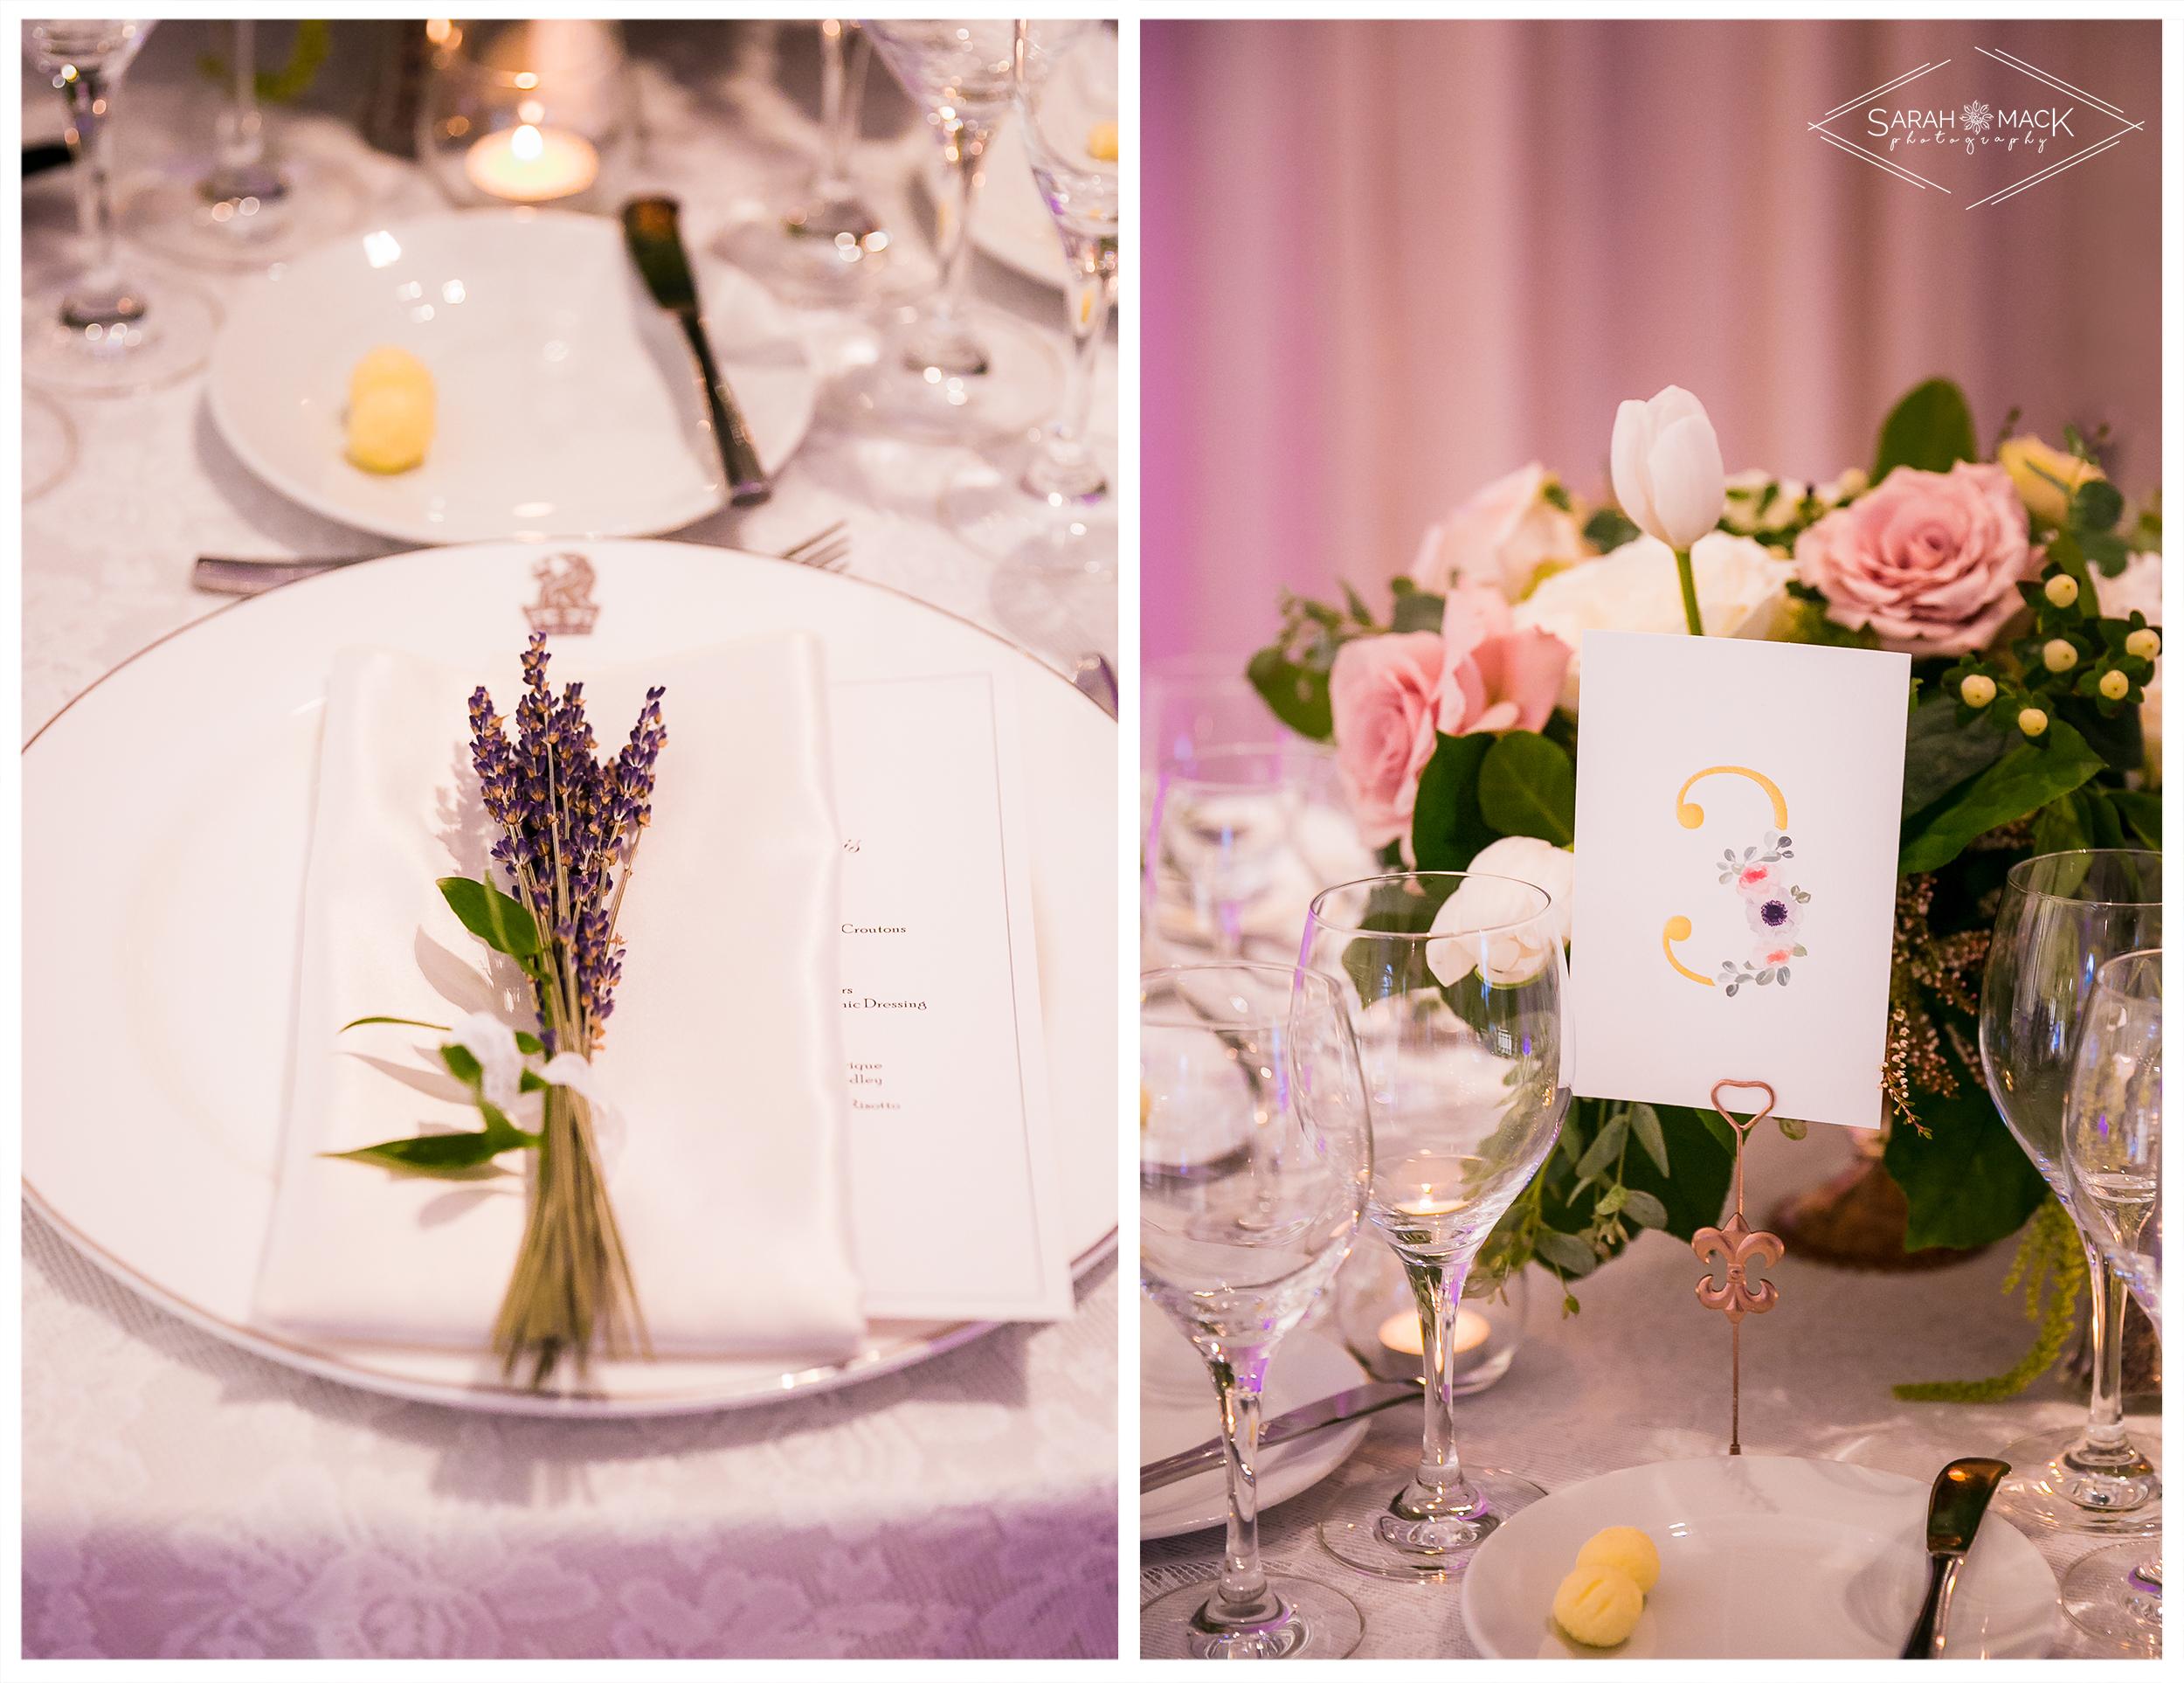 TD-Ritz-Carlton-Laguna-Niguel-Wedding-Photography-30.jpg